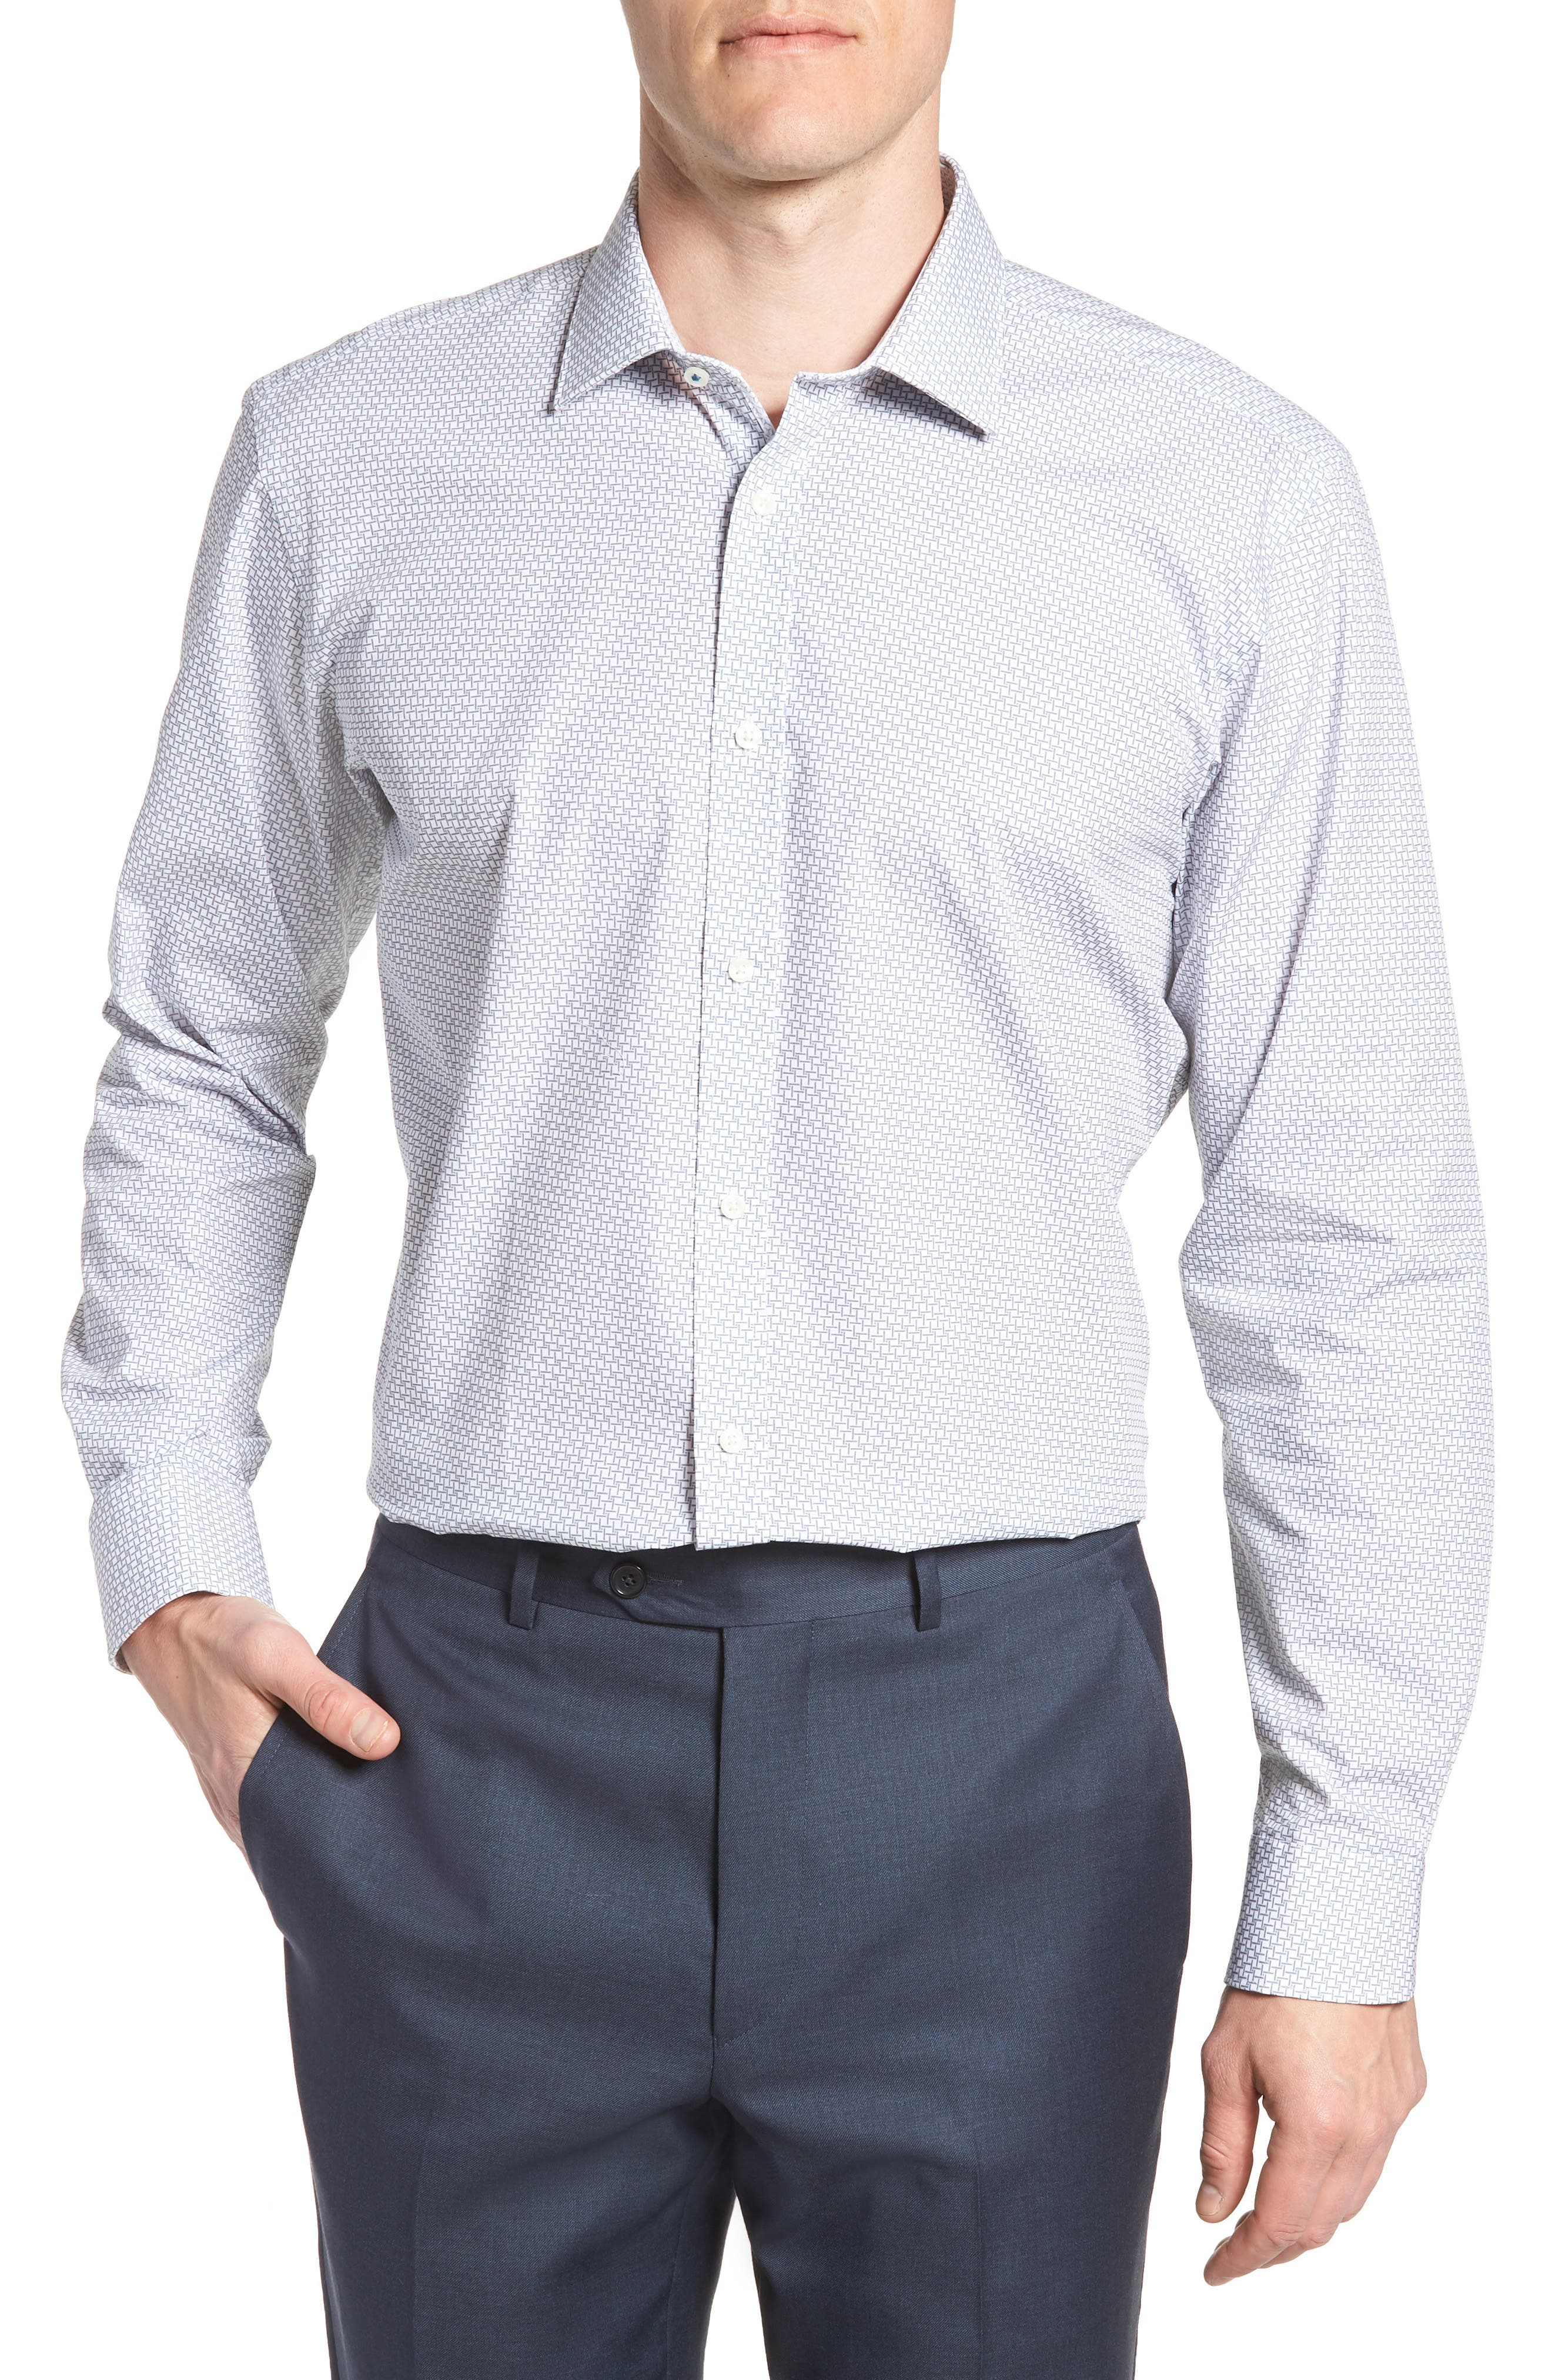 Rosprim Trim Fit Geometric Dress Shirt,                             Main thumbnail 1, color,                             GREY